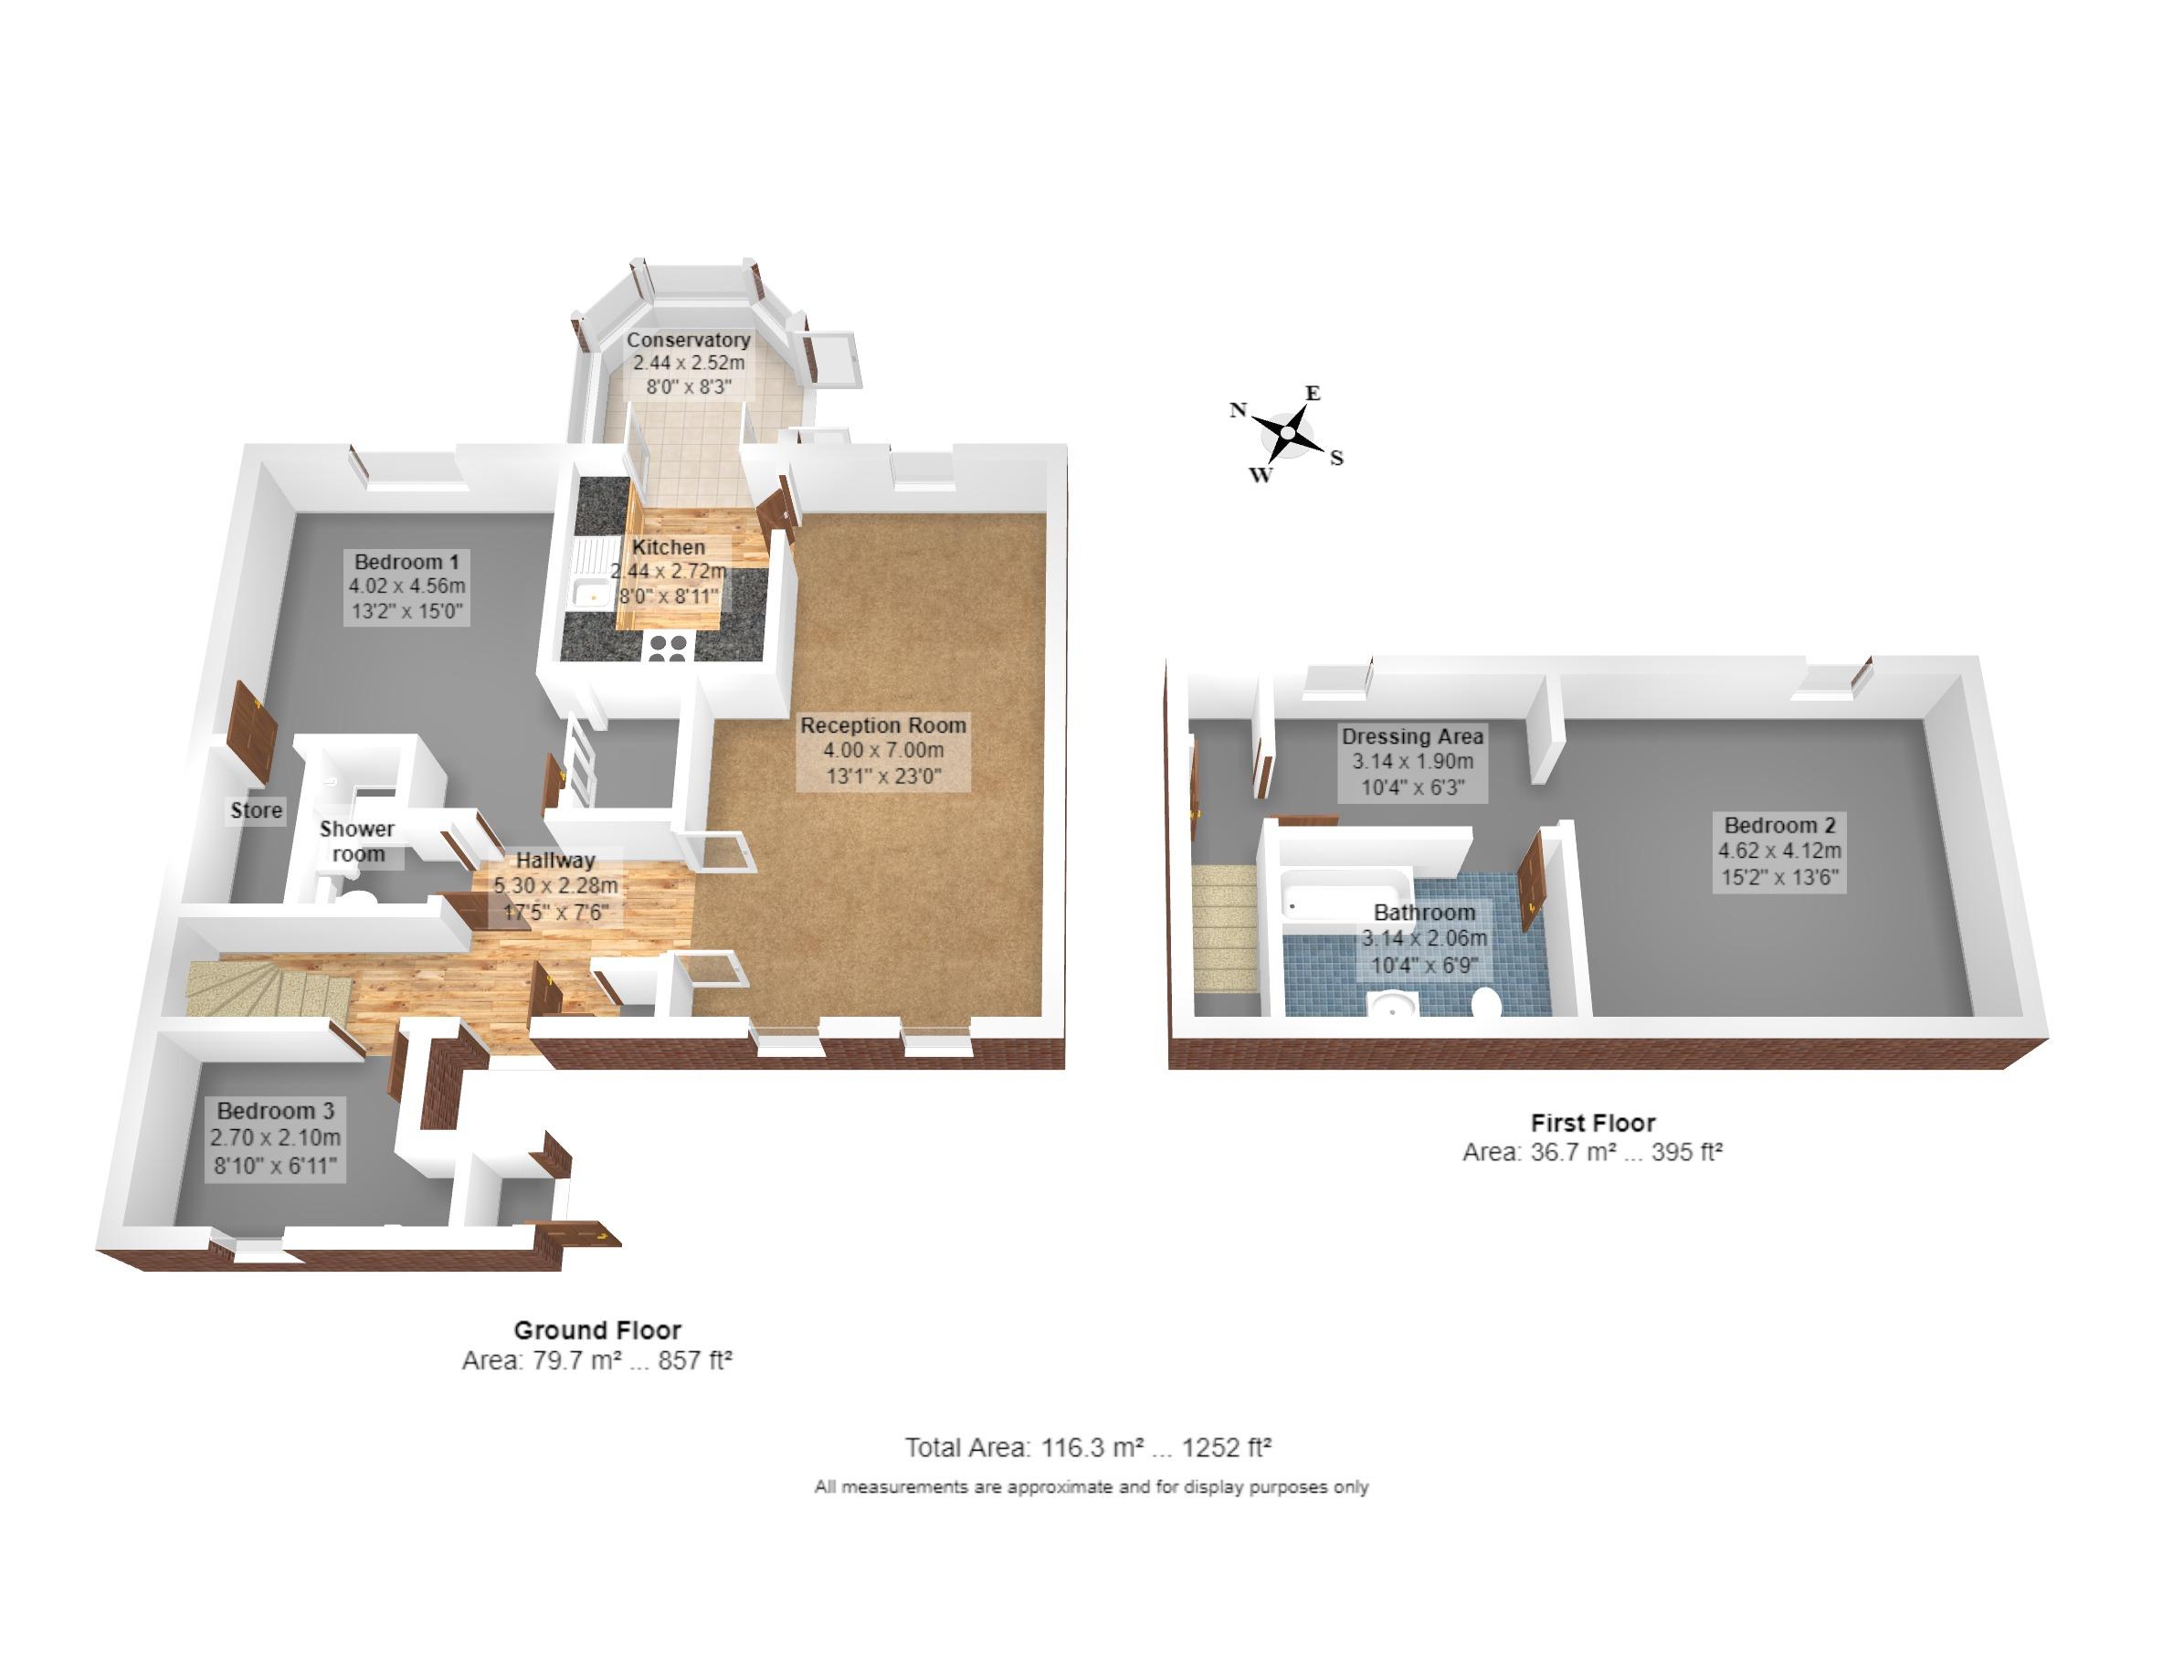 14 Whybrow Gardens Floorplan